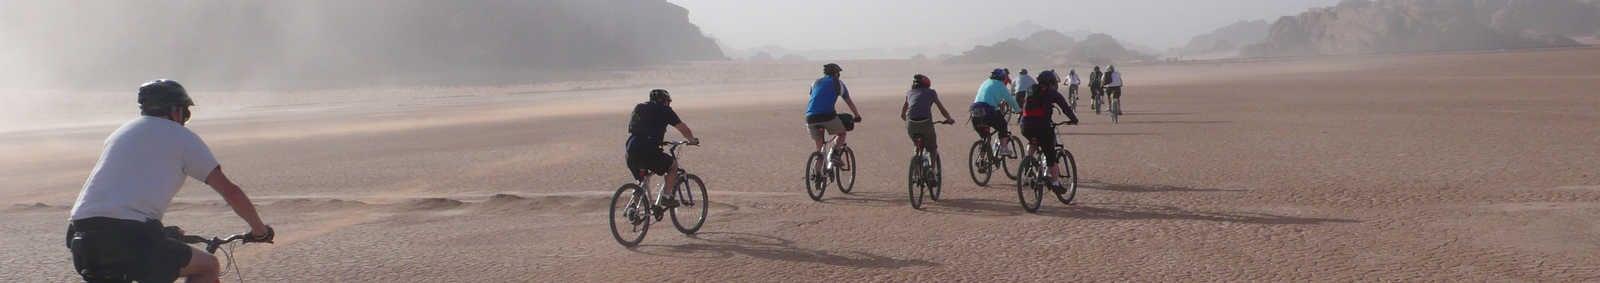 Cycling across the Wadi Rum desert